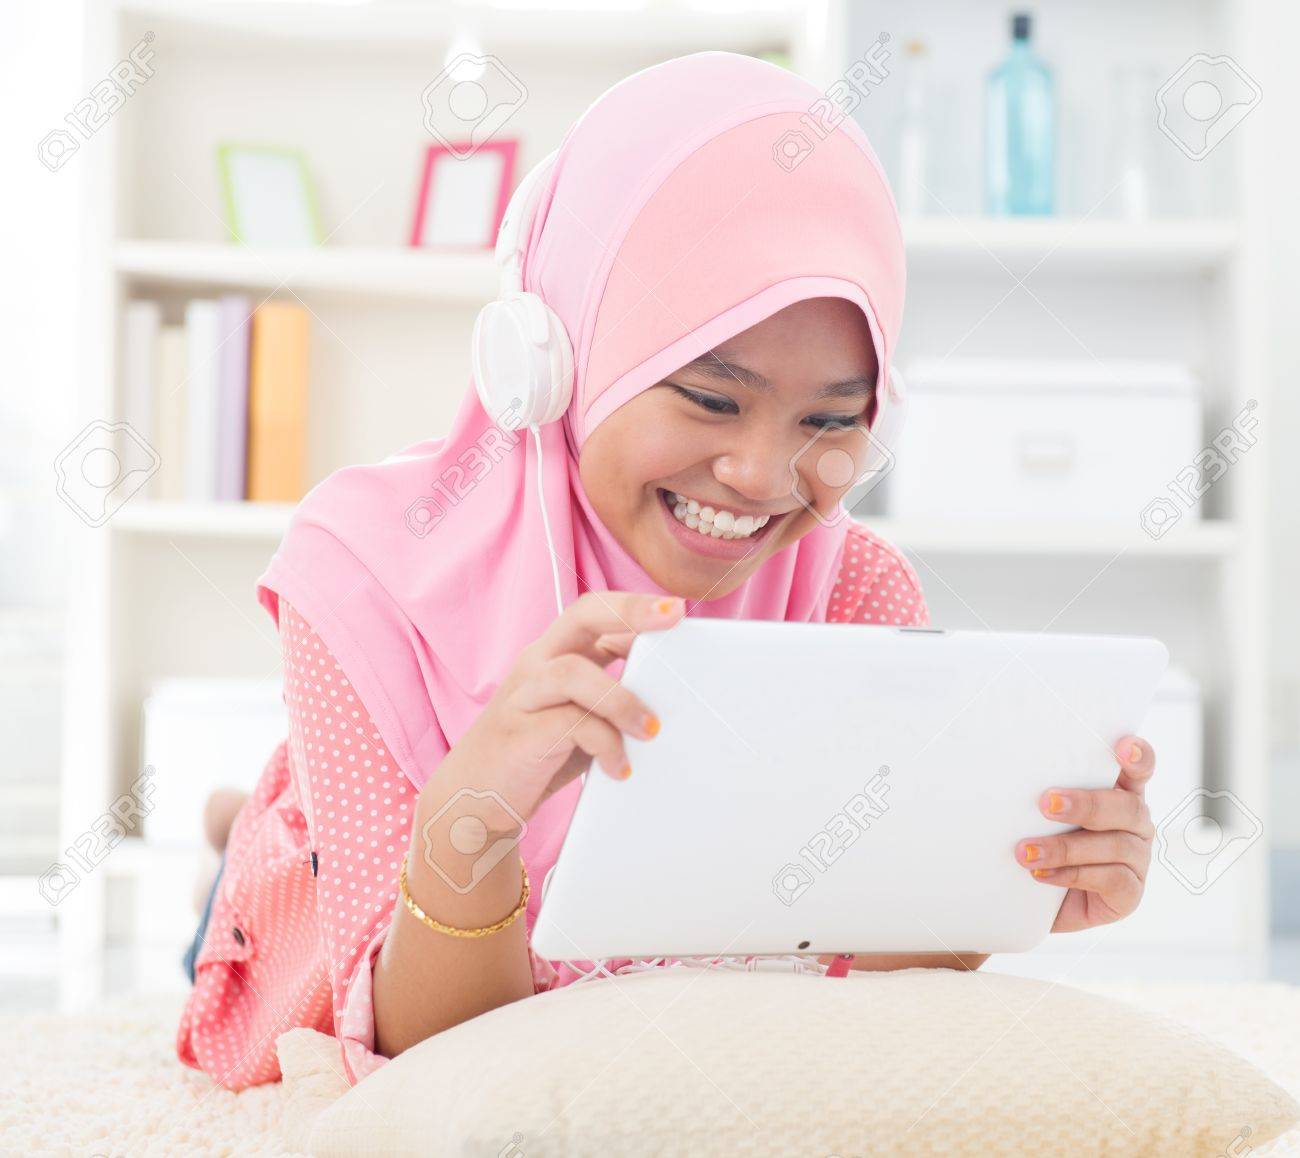 Southeast Asian teenager listen mp3 headphone at home. Muslim teen girl living lifestyle. Stock Photo - 17056487